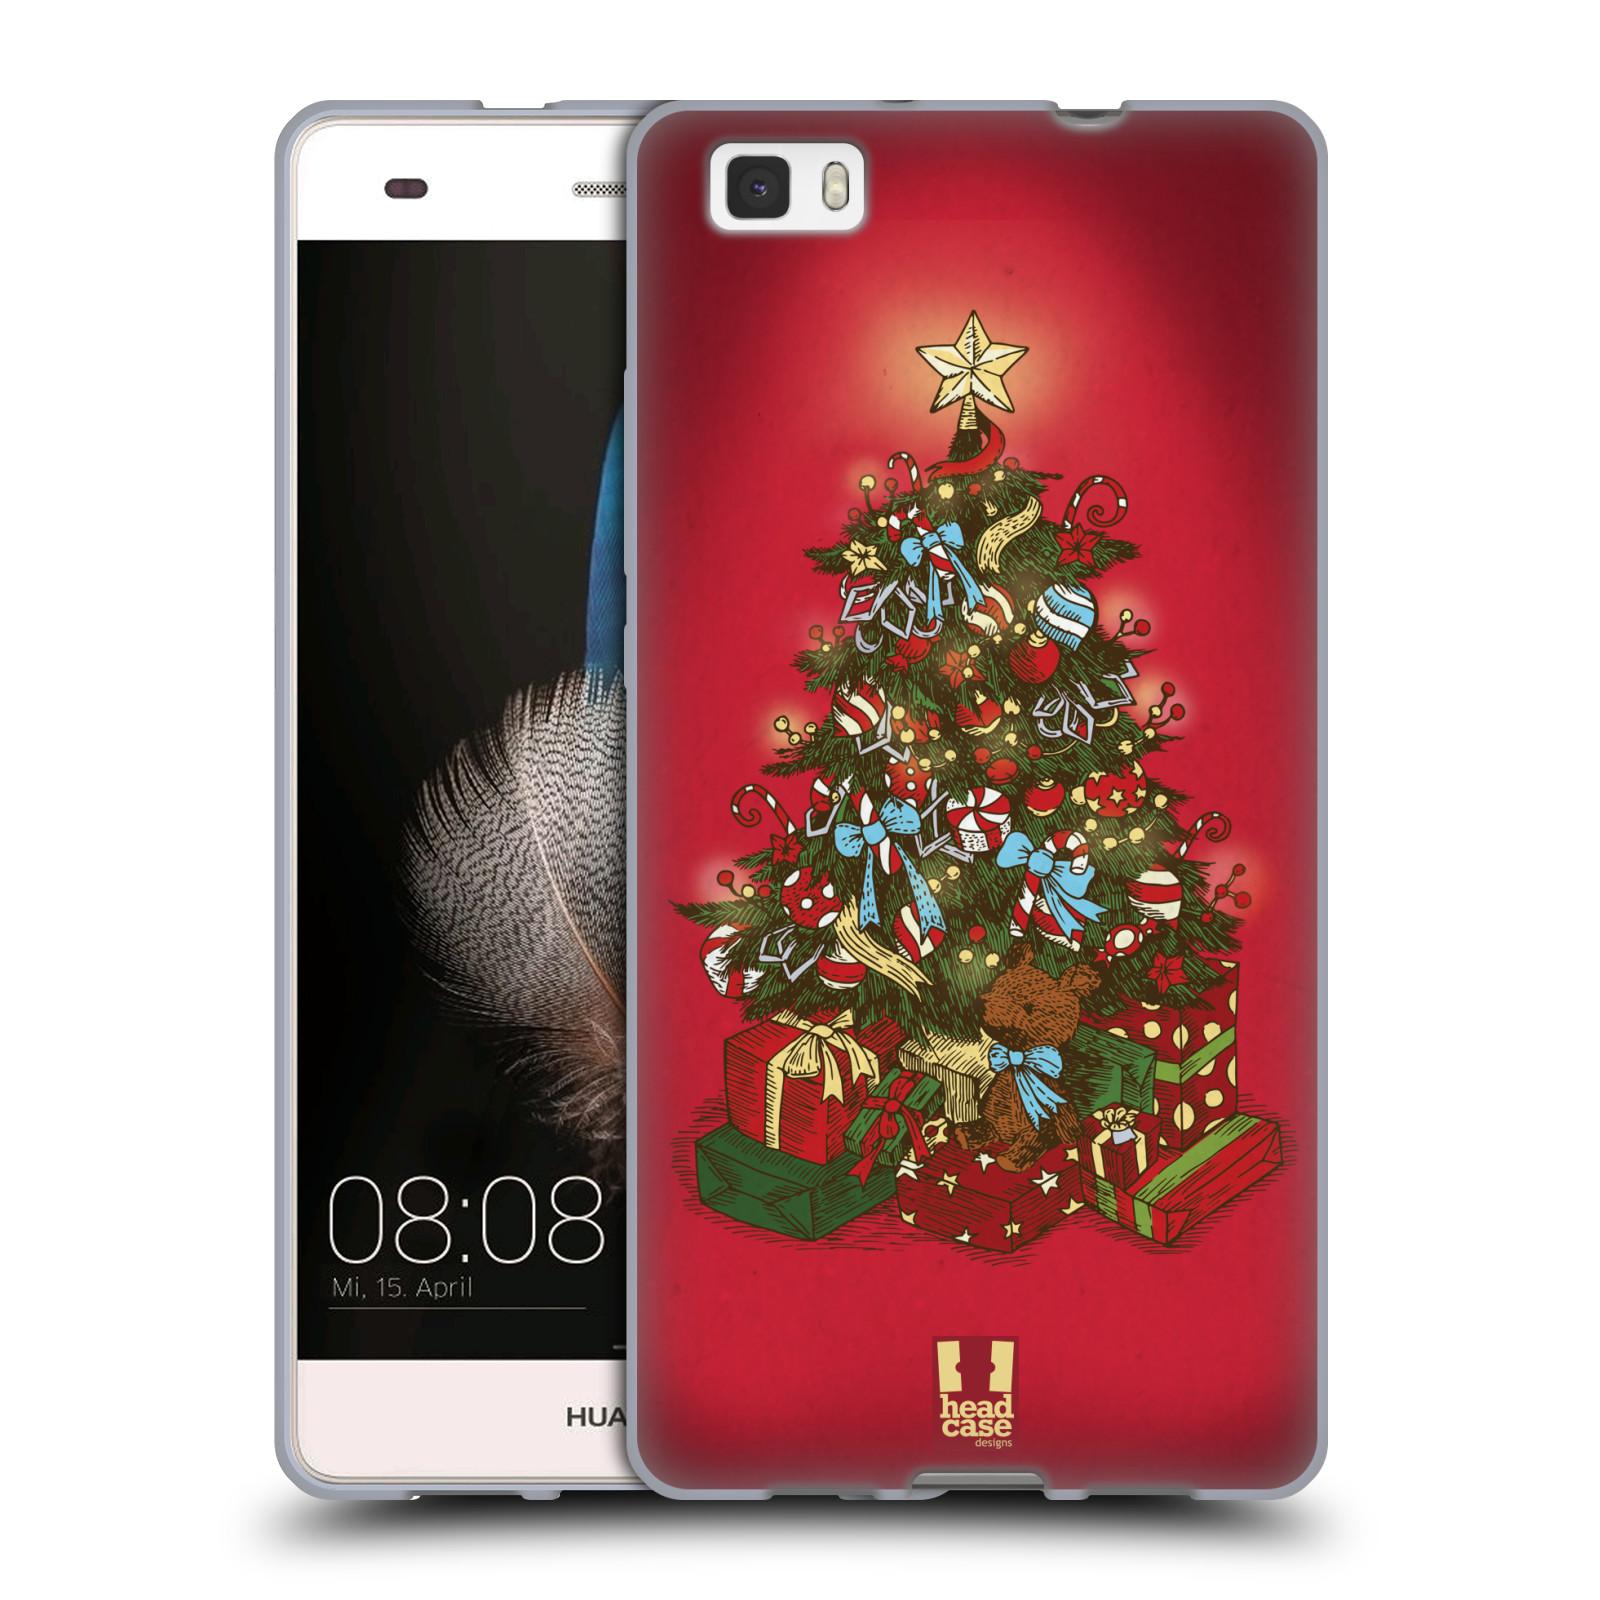 Silikonové pouzdro na mobil Huawei P8 Lite - Head Case - Stromeček